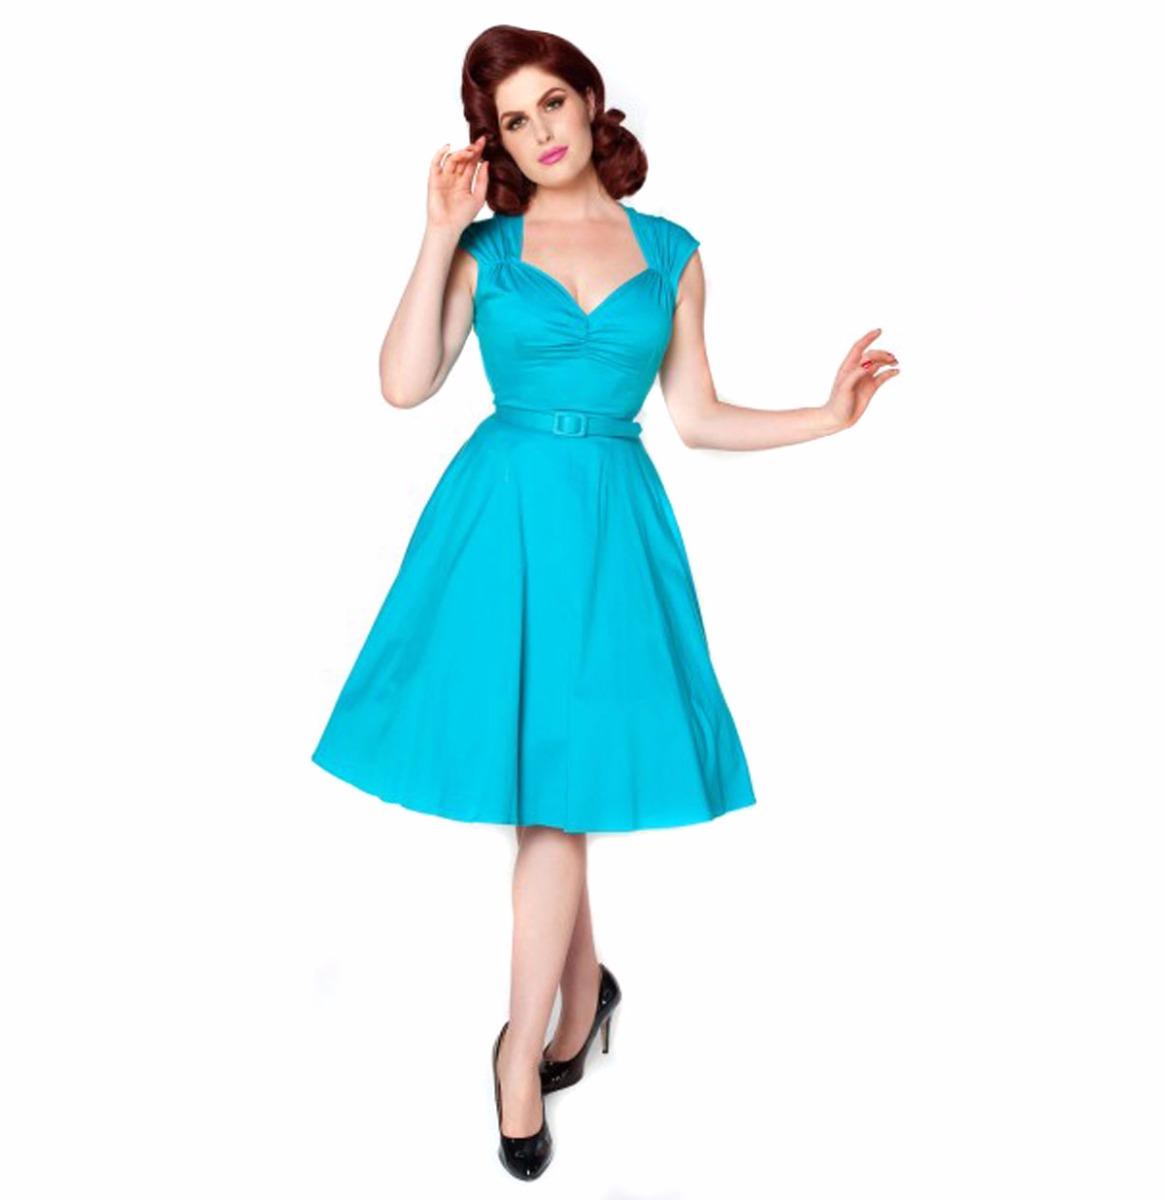 Pinup Couture Heidi Jurk, Bright Blauw